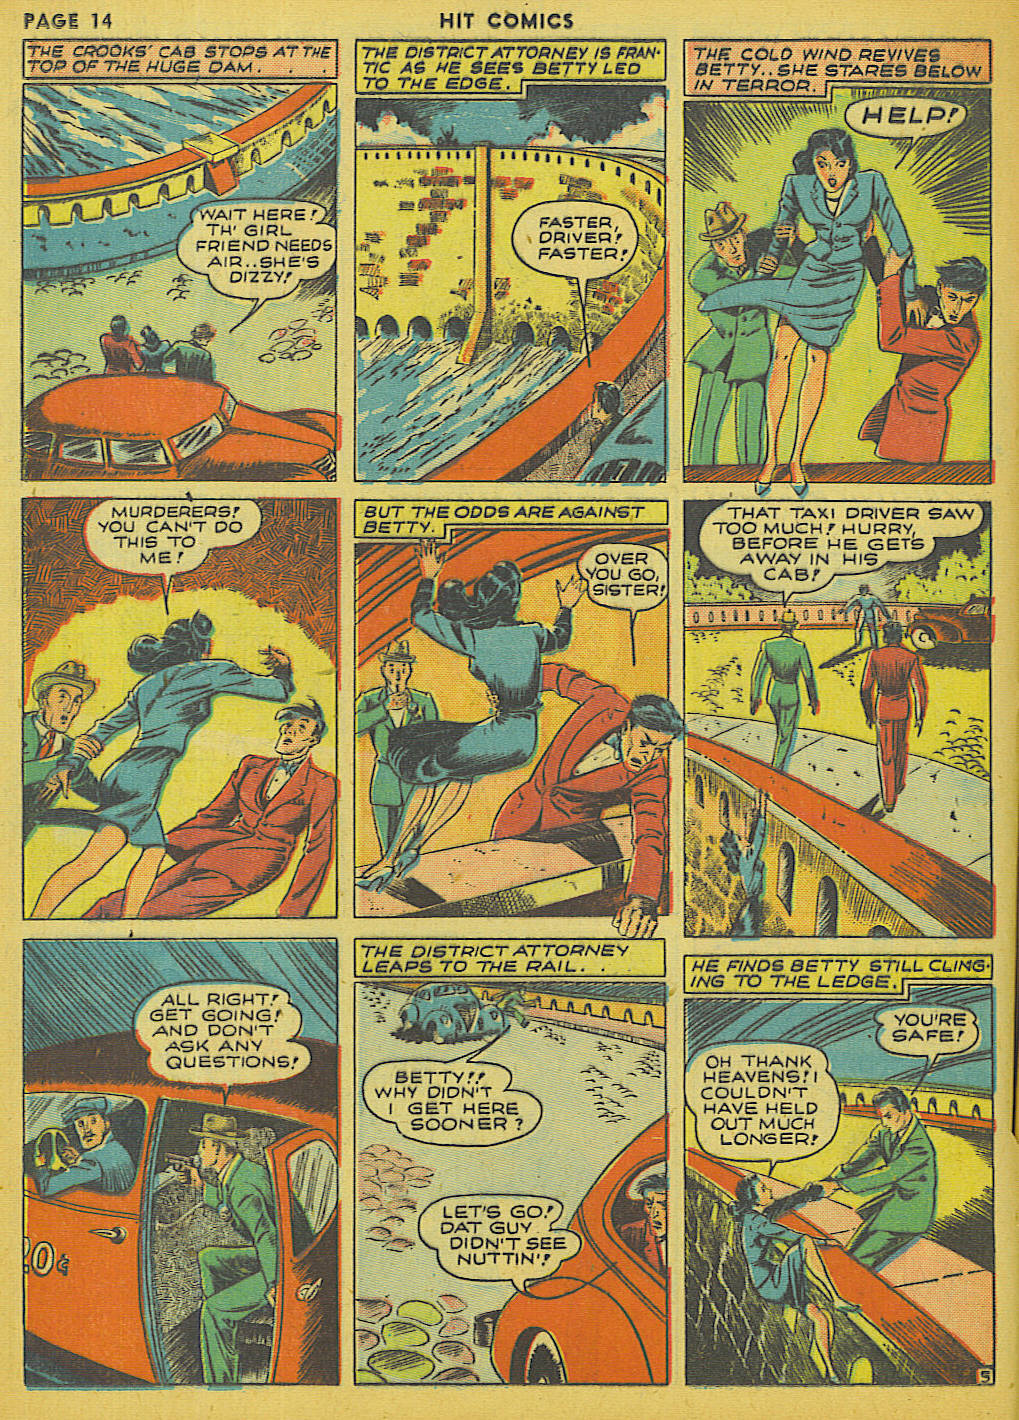 Read online Hit Comics comic -  Issue #13 - 16